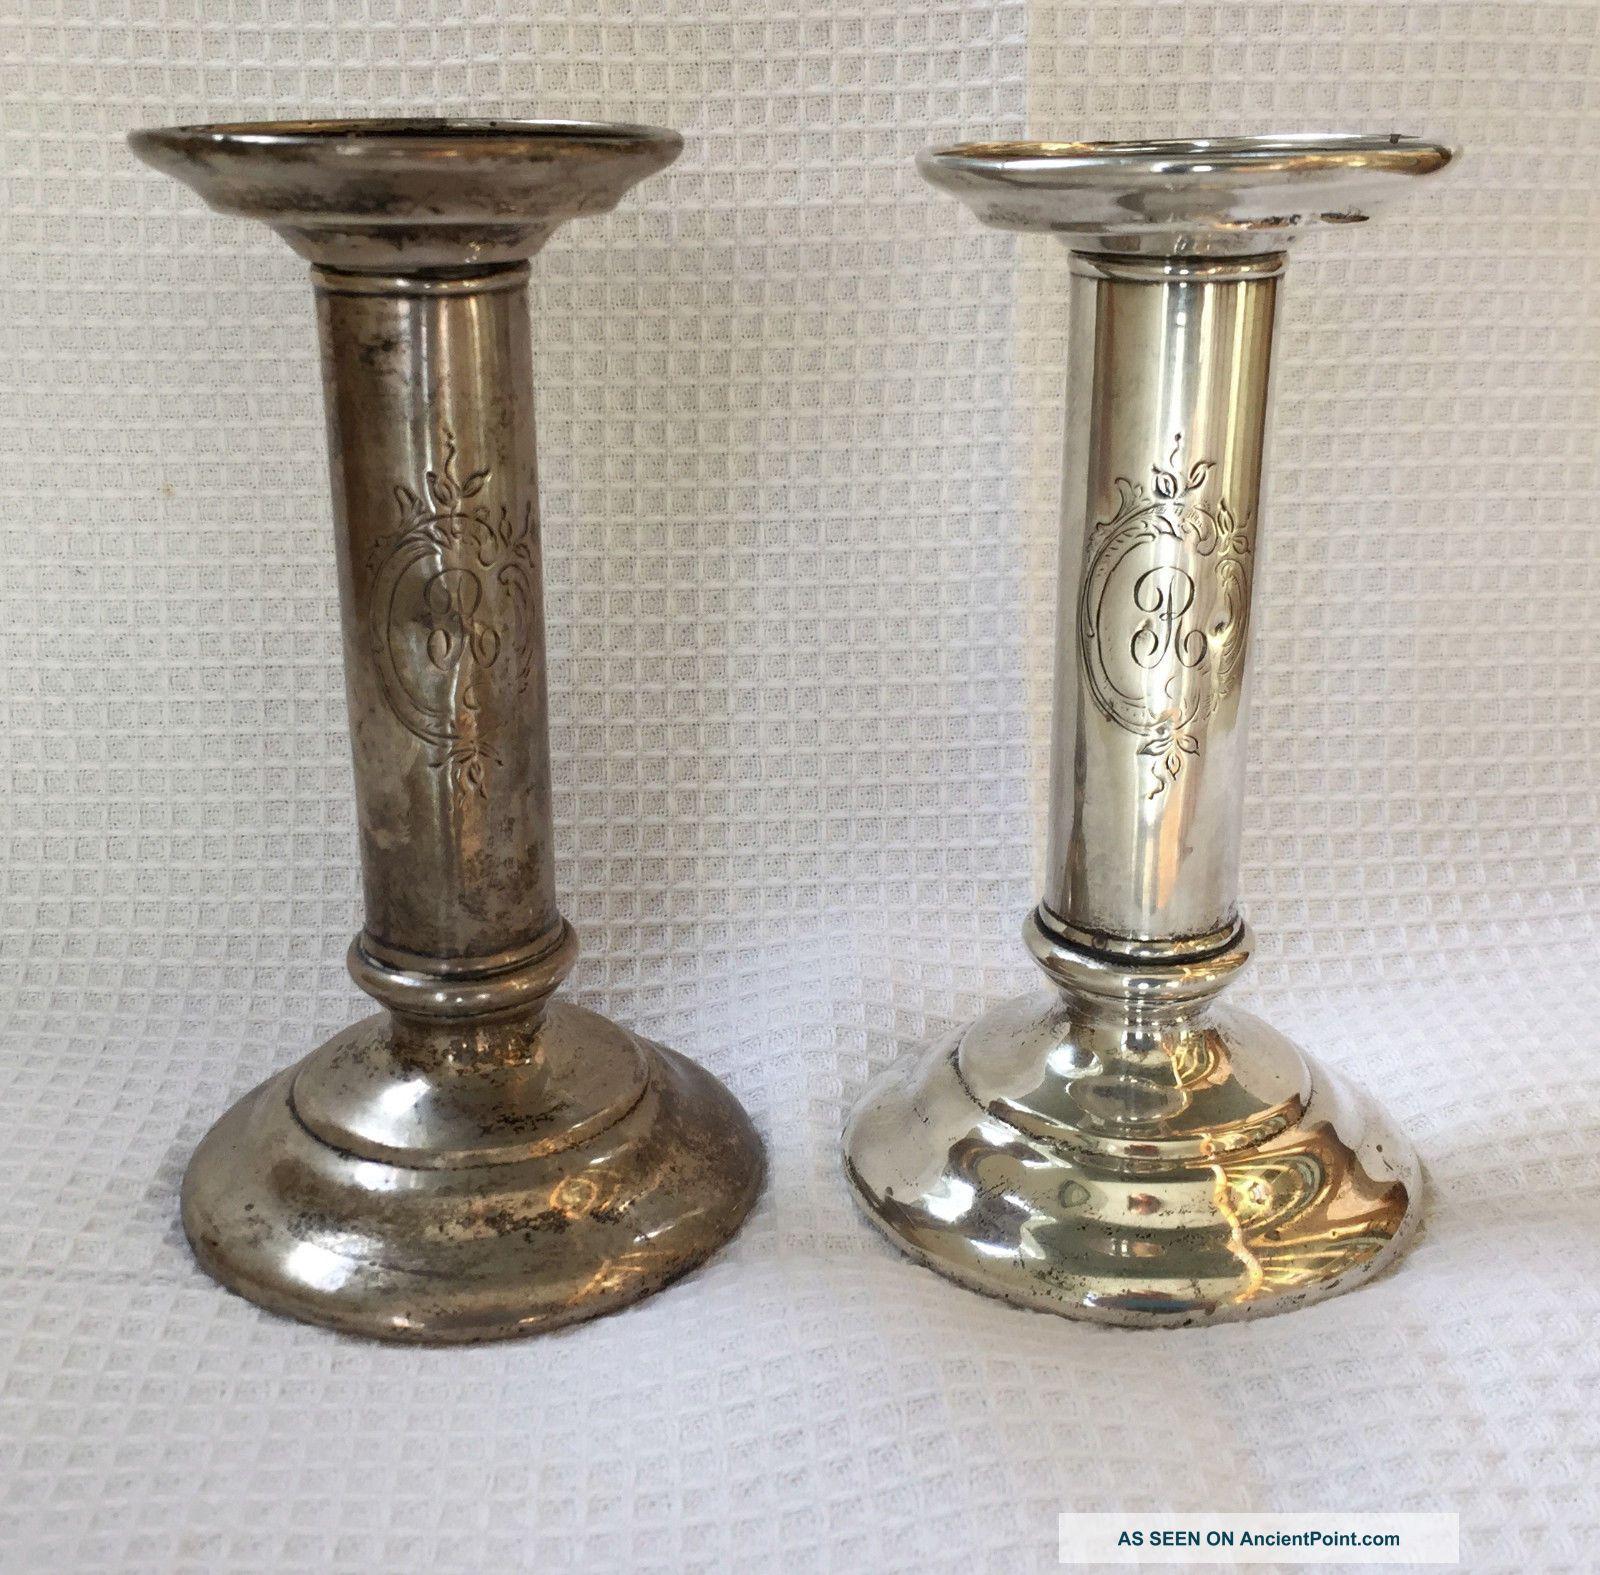 Antique Tiffany & Co Sterling Silver Candlesticks 925 Circa 1940s Candlesticks & Candelabra photo